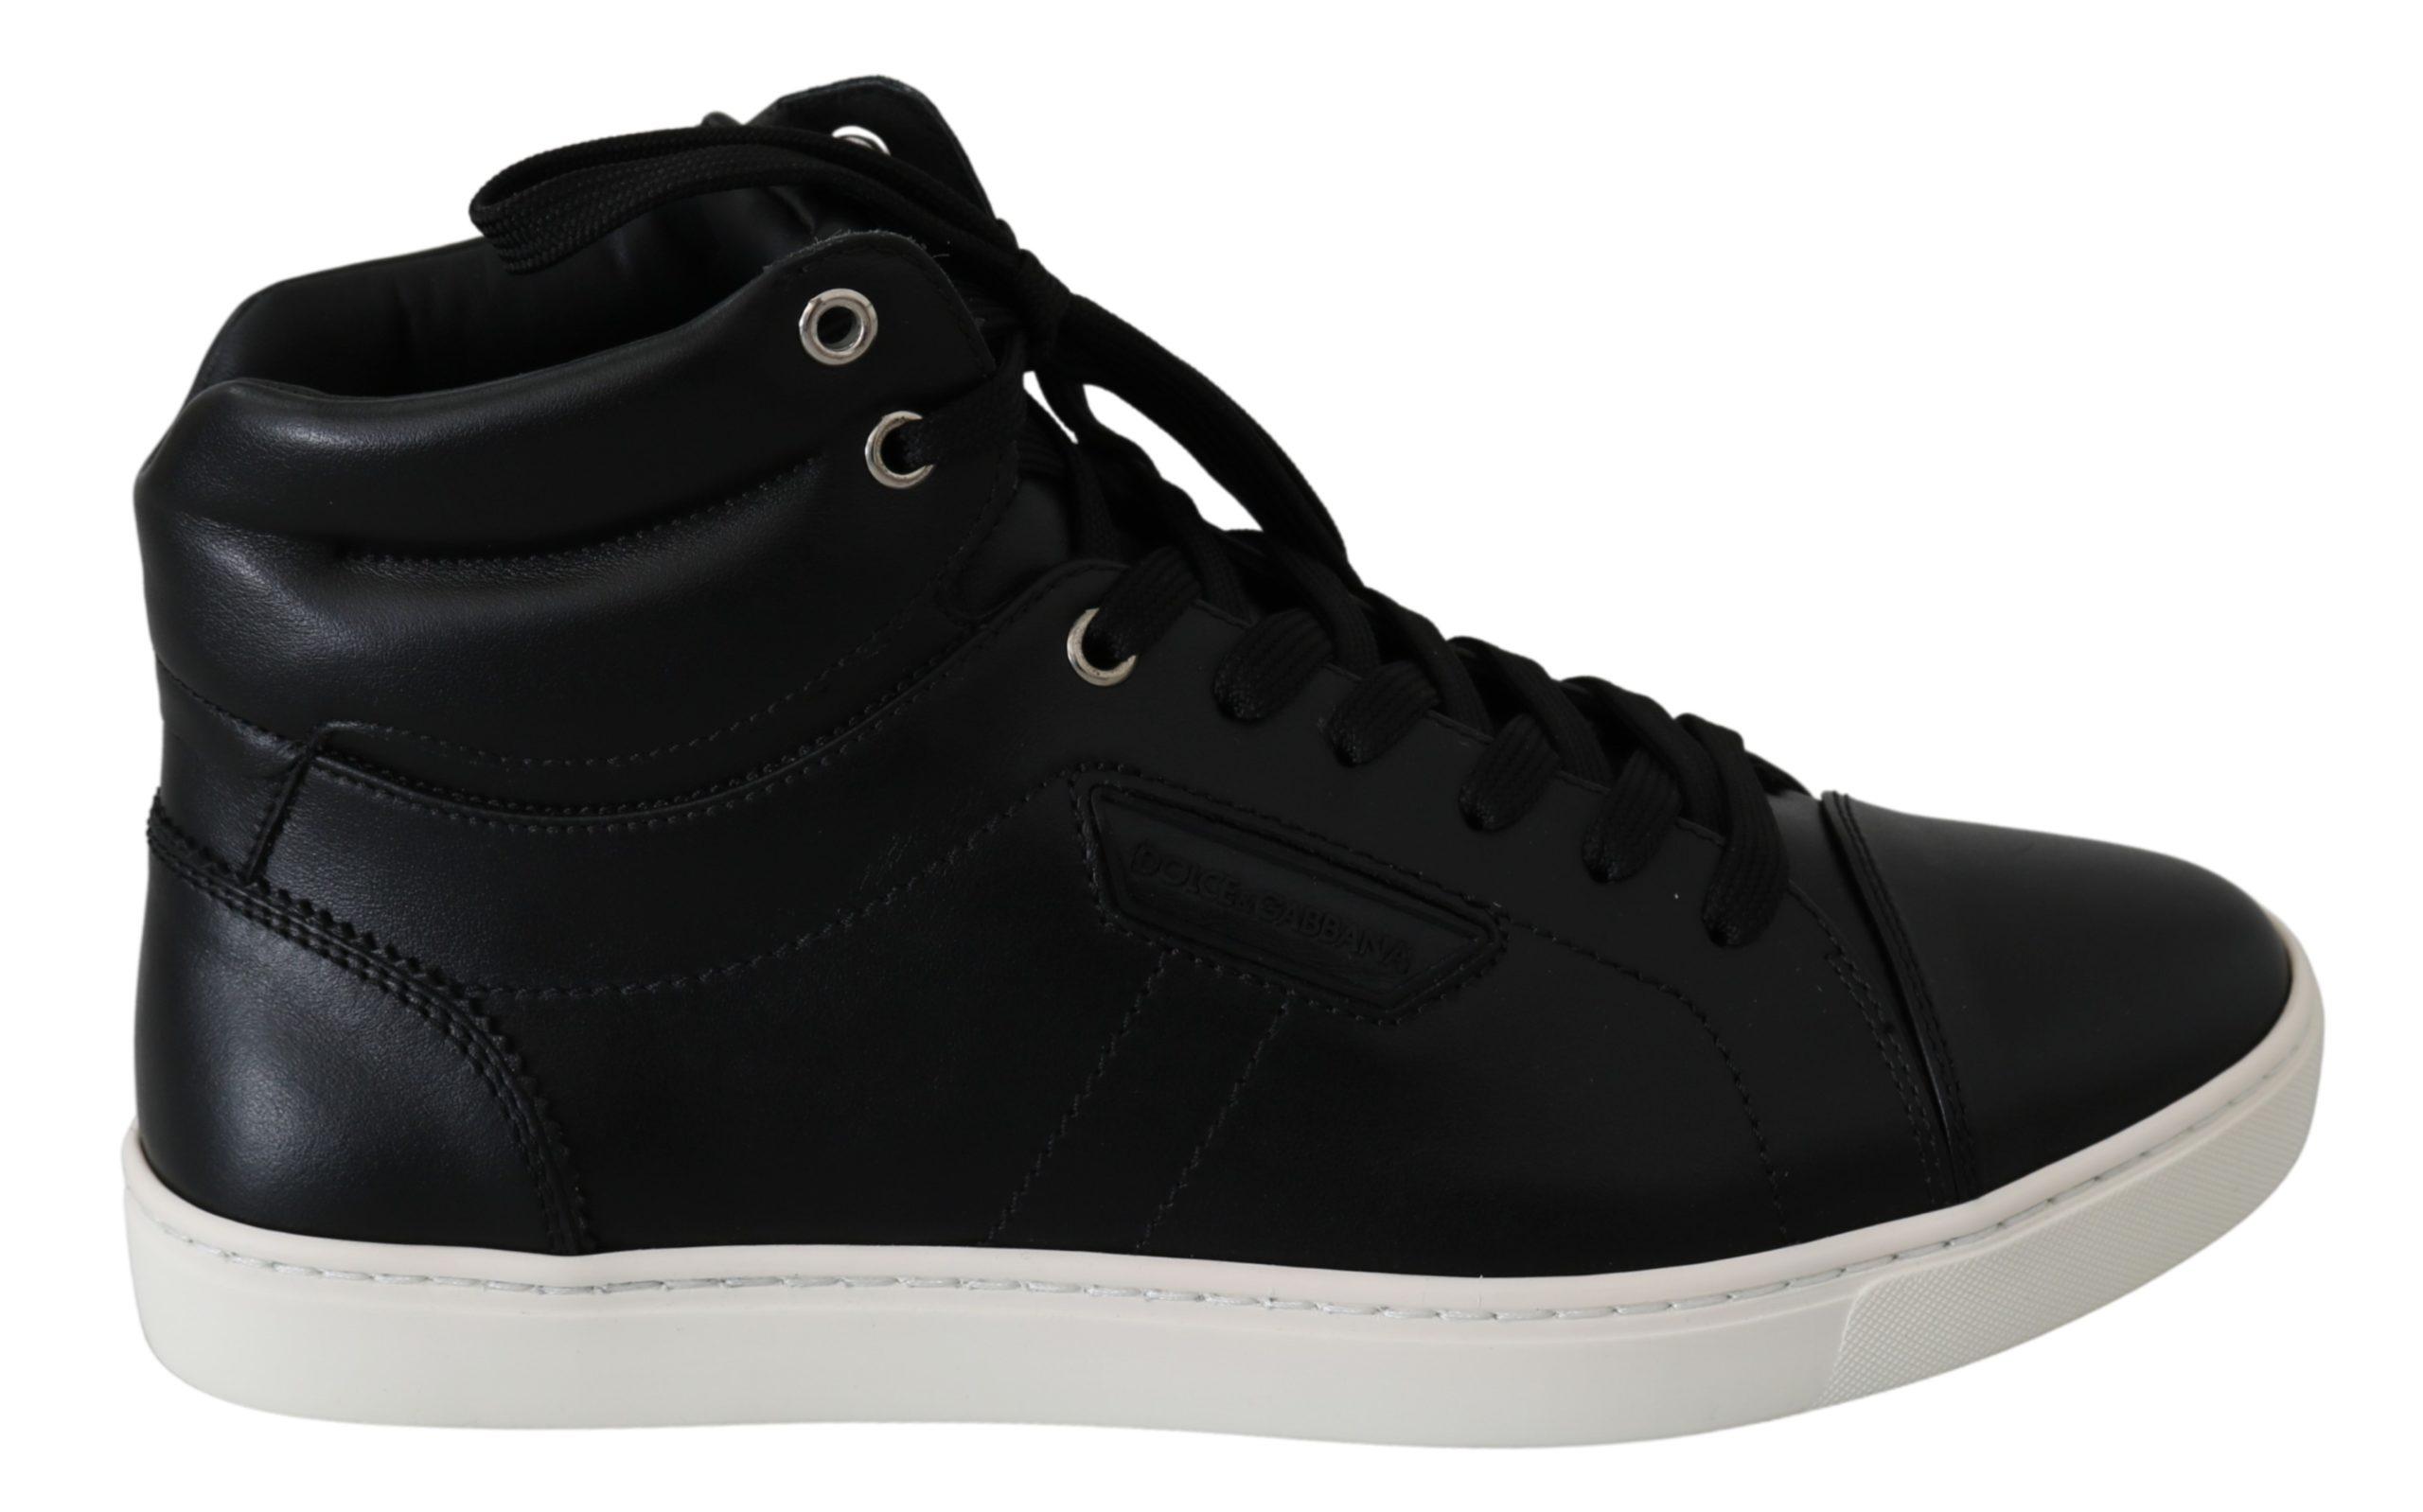 Dolce & Gabbana Men's Leather High-Top Trainer Black MV2652 - EU40/US7